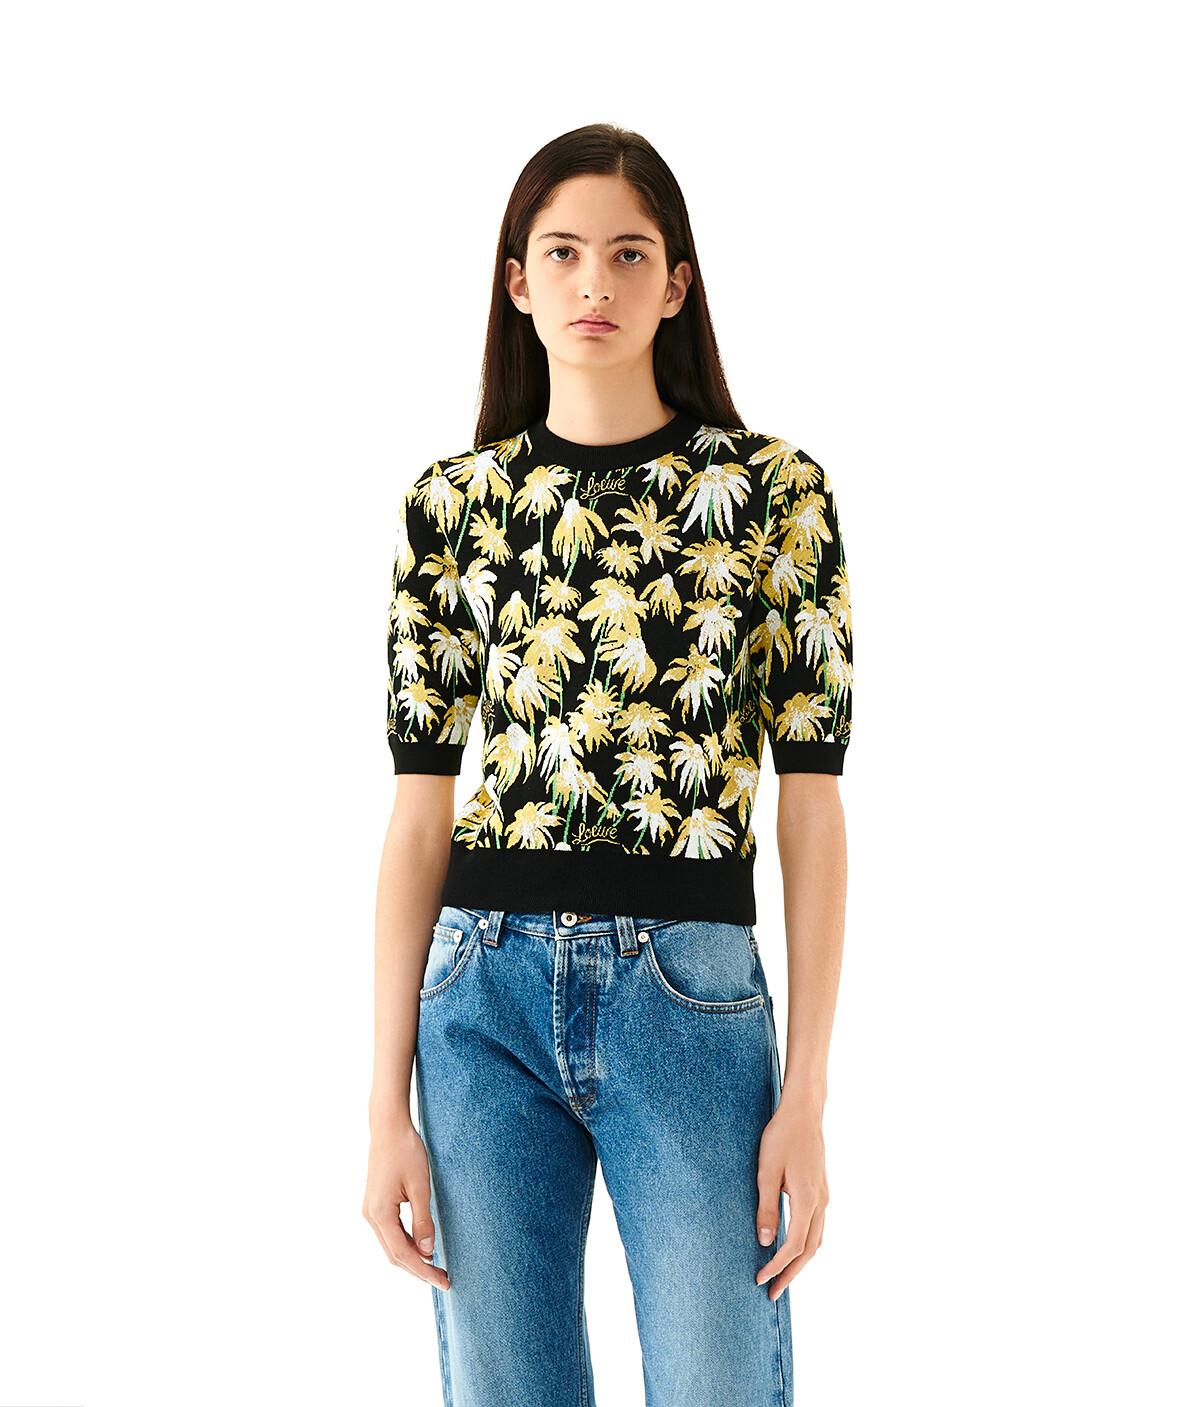 LOEWE Daisy Jacquard Cropped Sweater Black/Yellow front